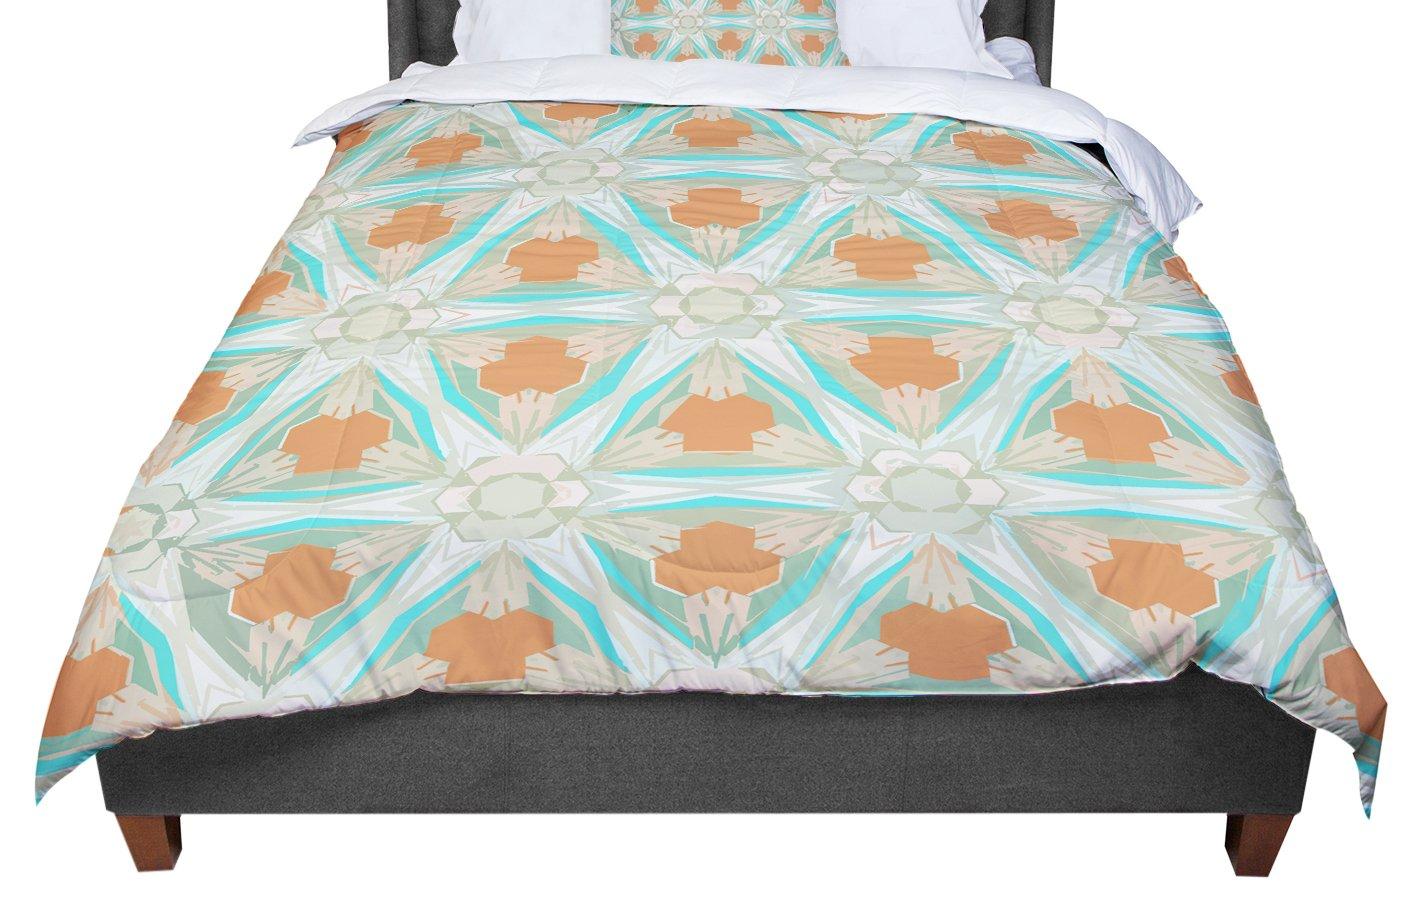 68 X 88 KESS InHouse Alison Coxon Moorish Teal White Teal Twin Comforter